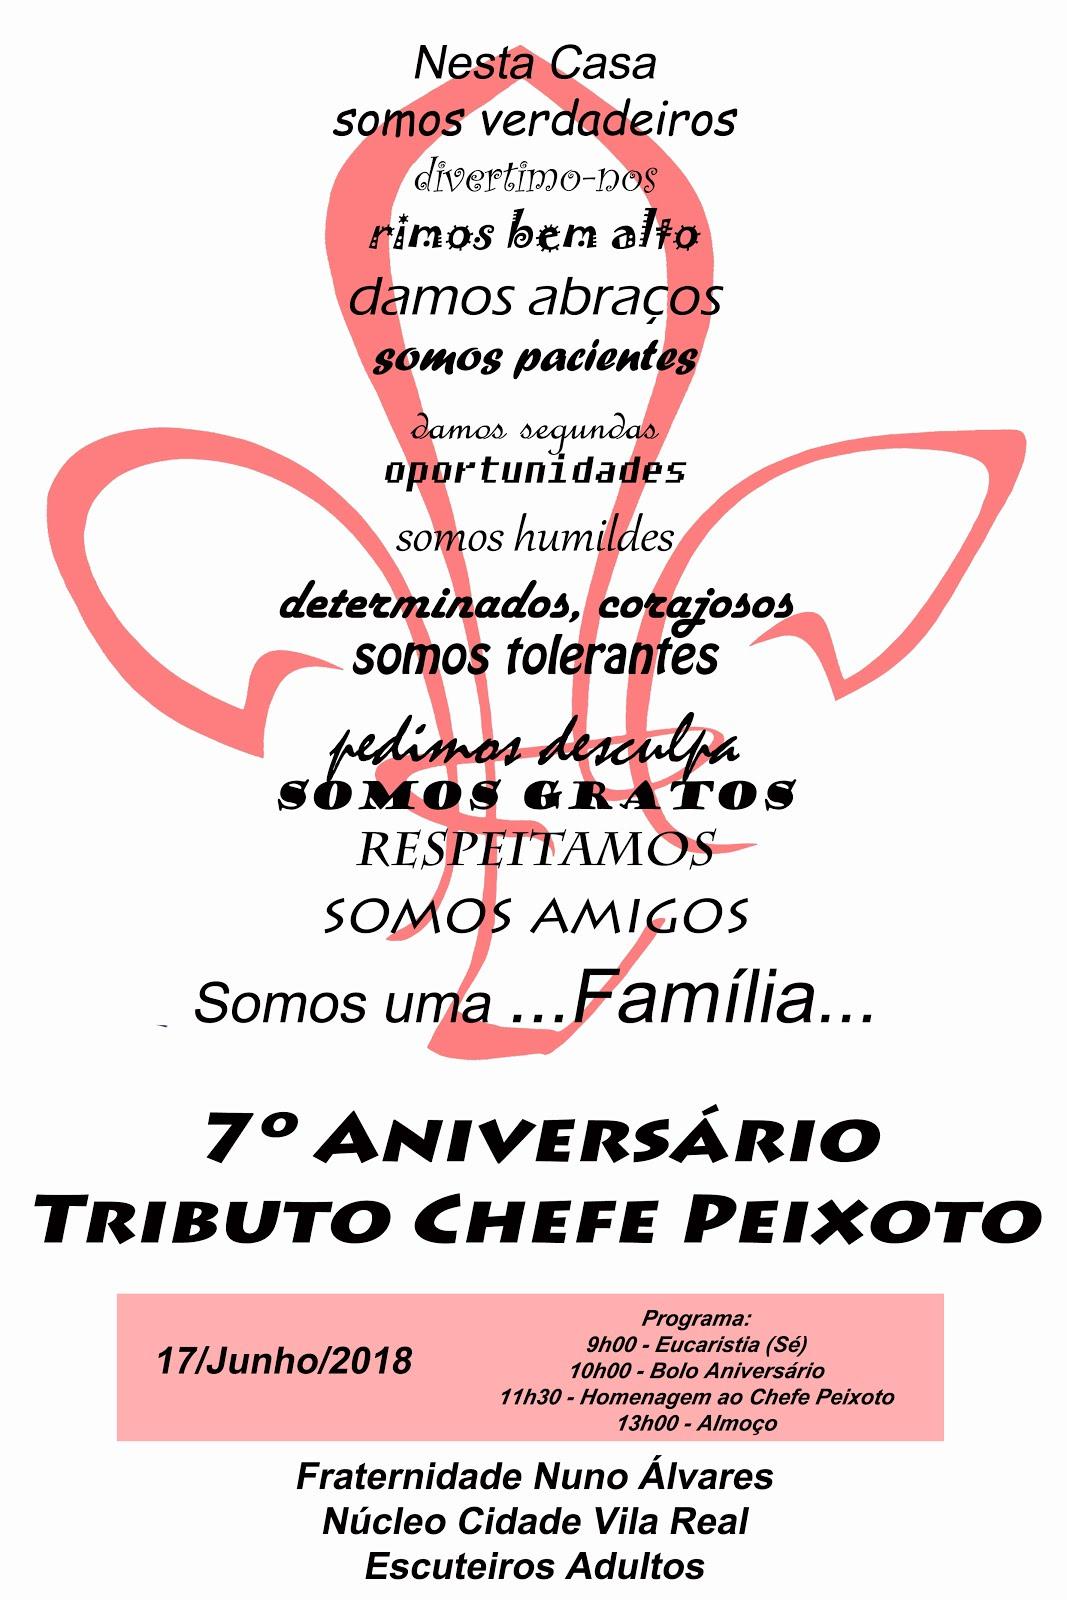 7º ANINUC/TRIBUTO CHEFE PEIXOTO